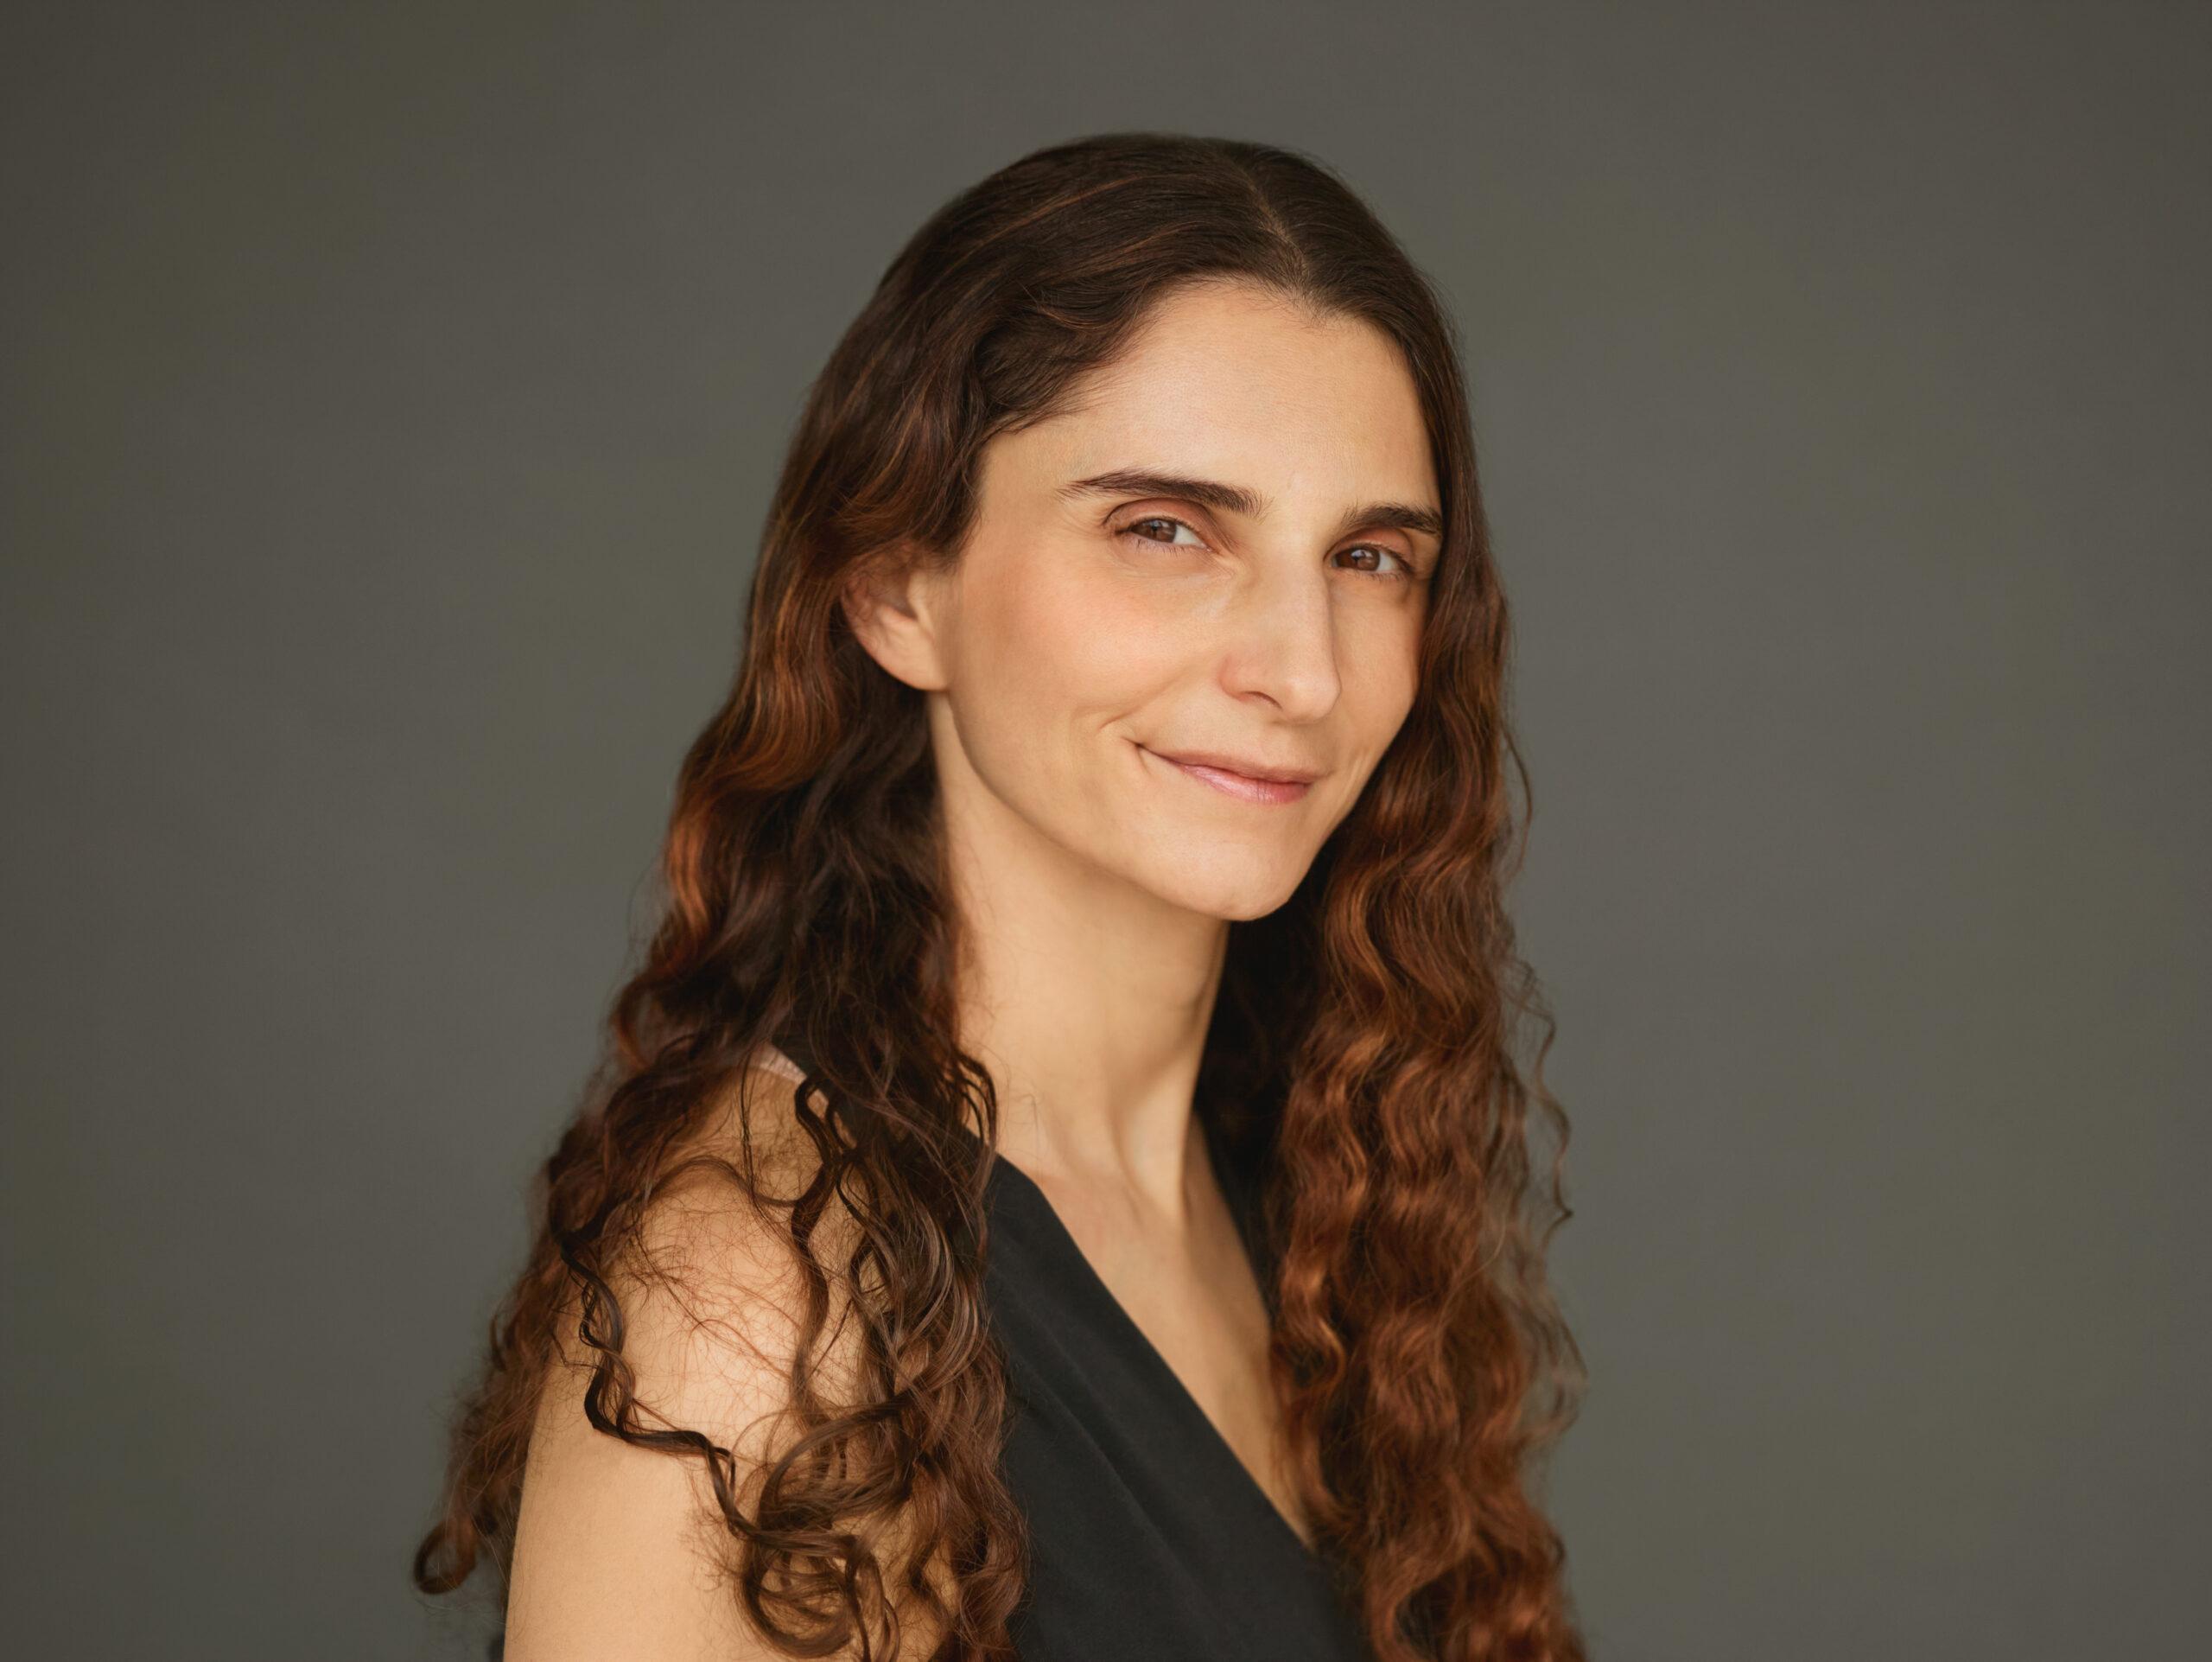 34: Alana Karen | Flood the System to Change It